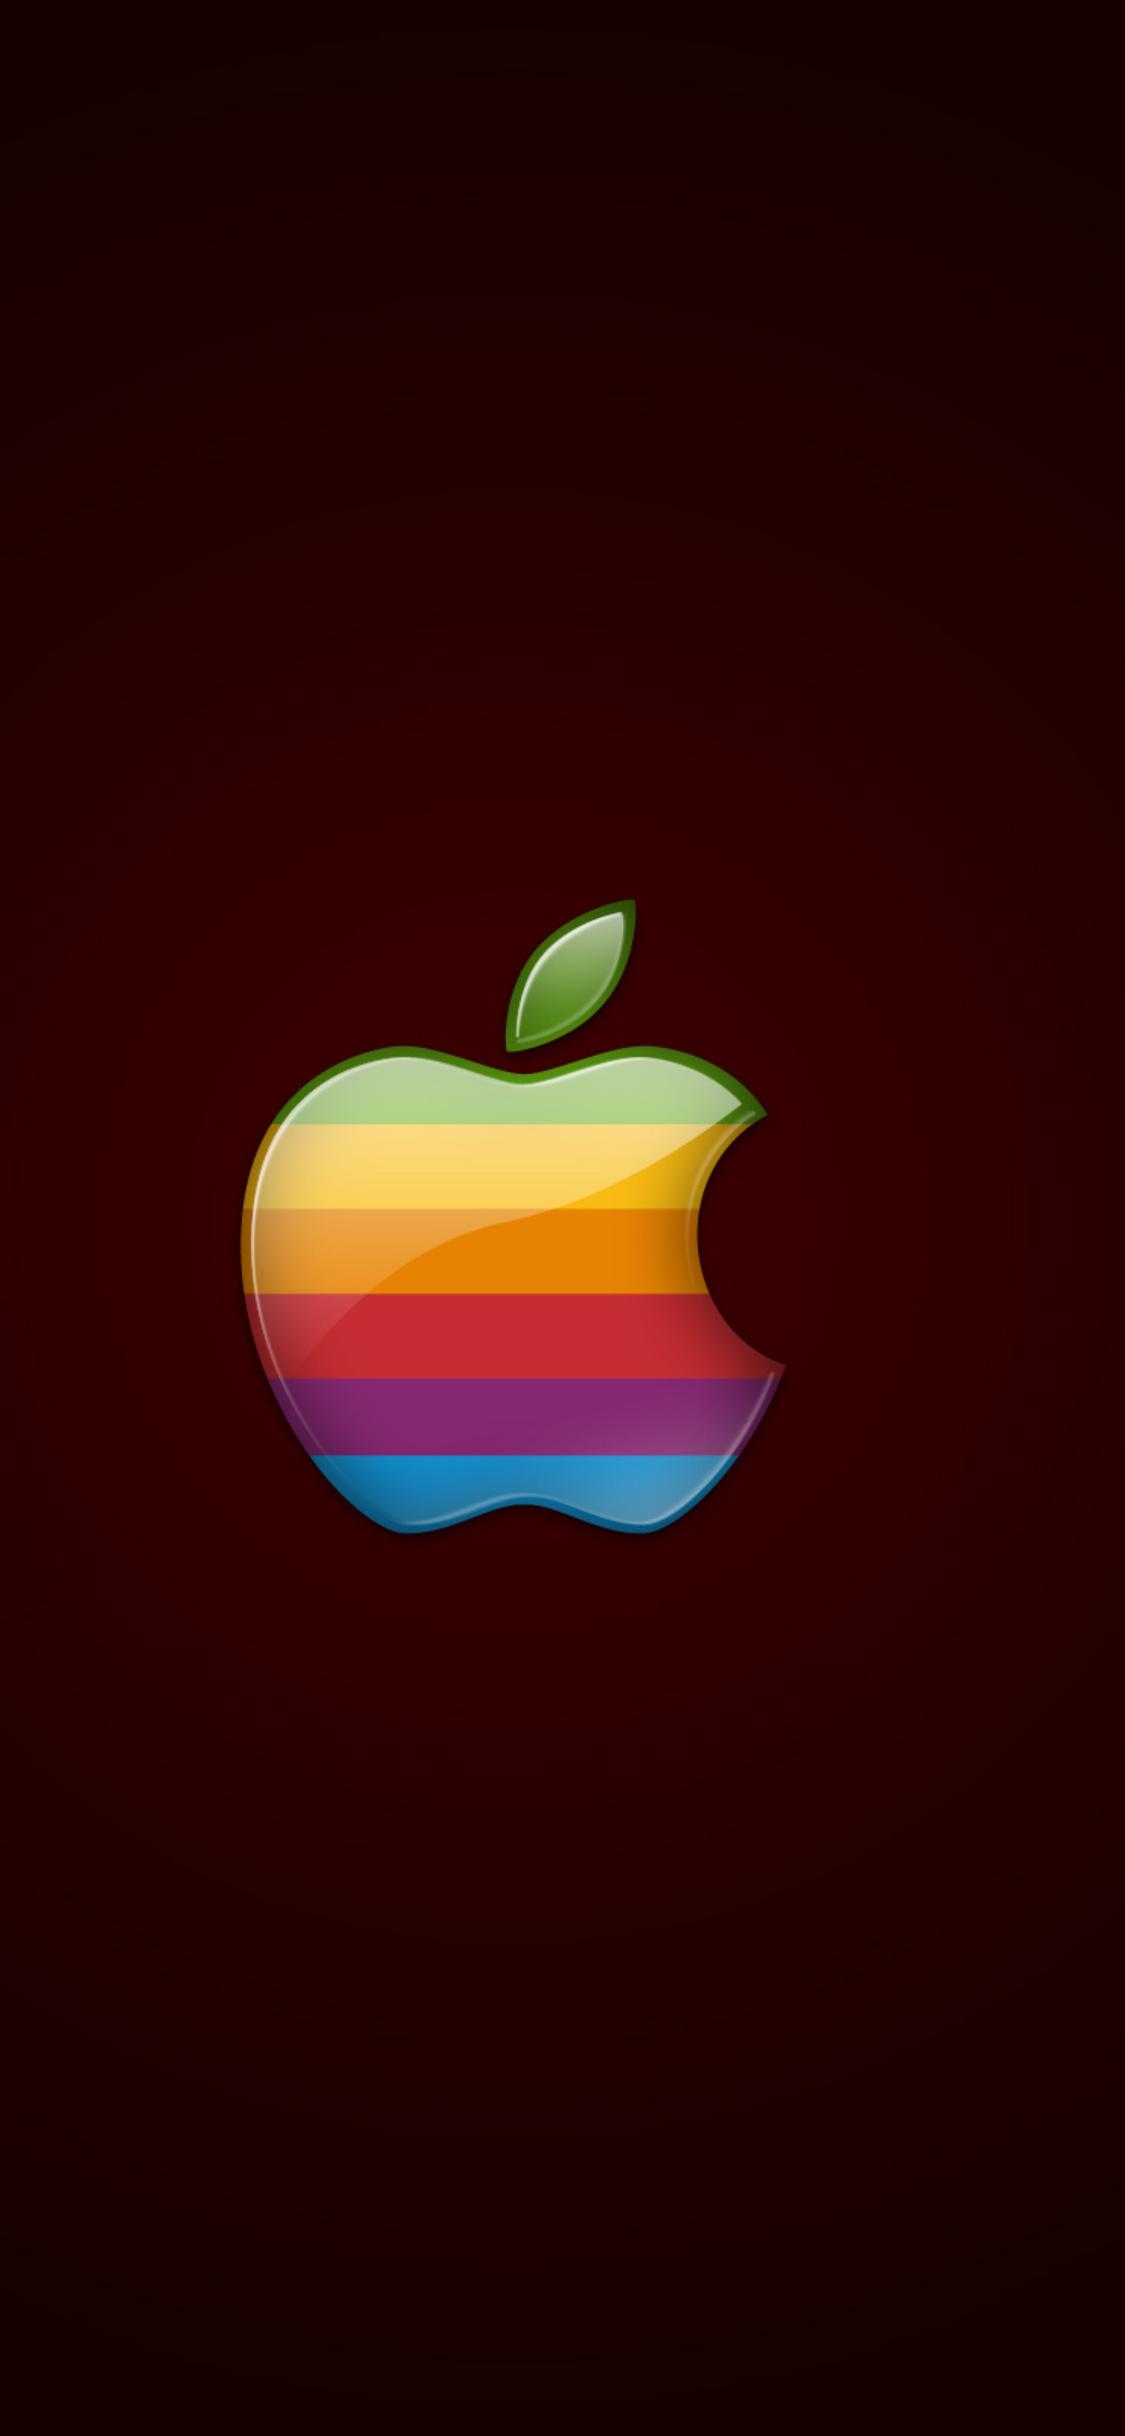 1125x2436 Retro Apple Logo Iphone Xs Iphone 10 Iphone X Hd